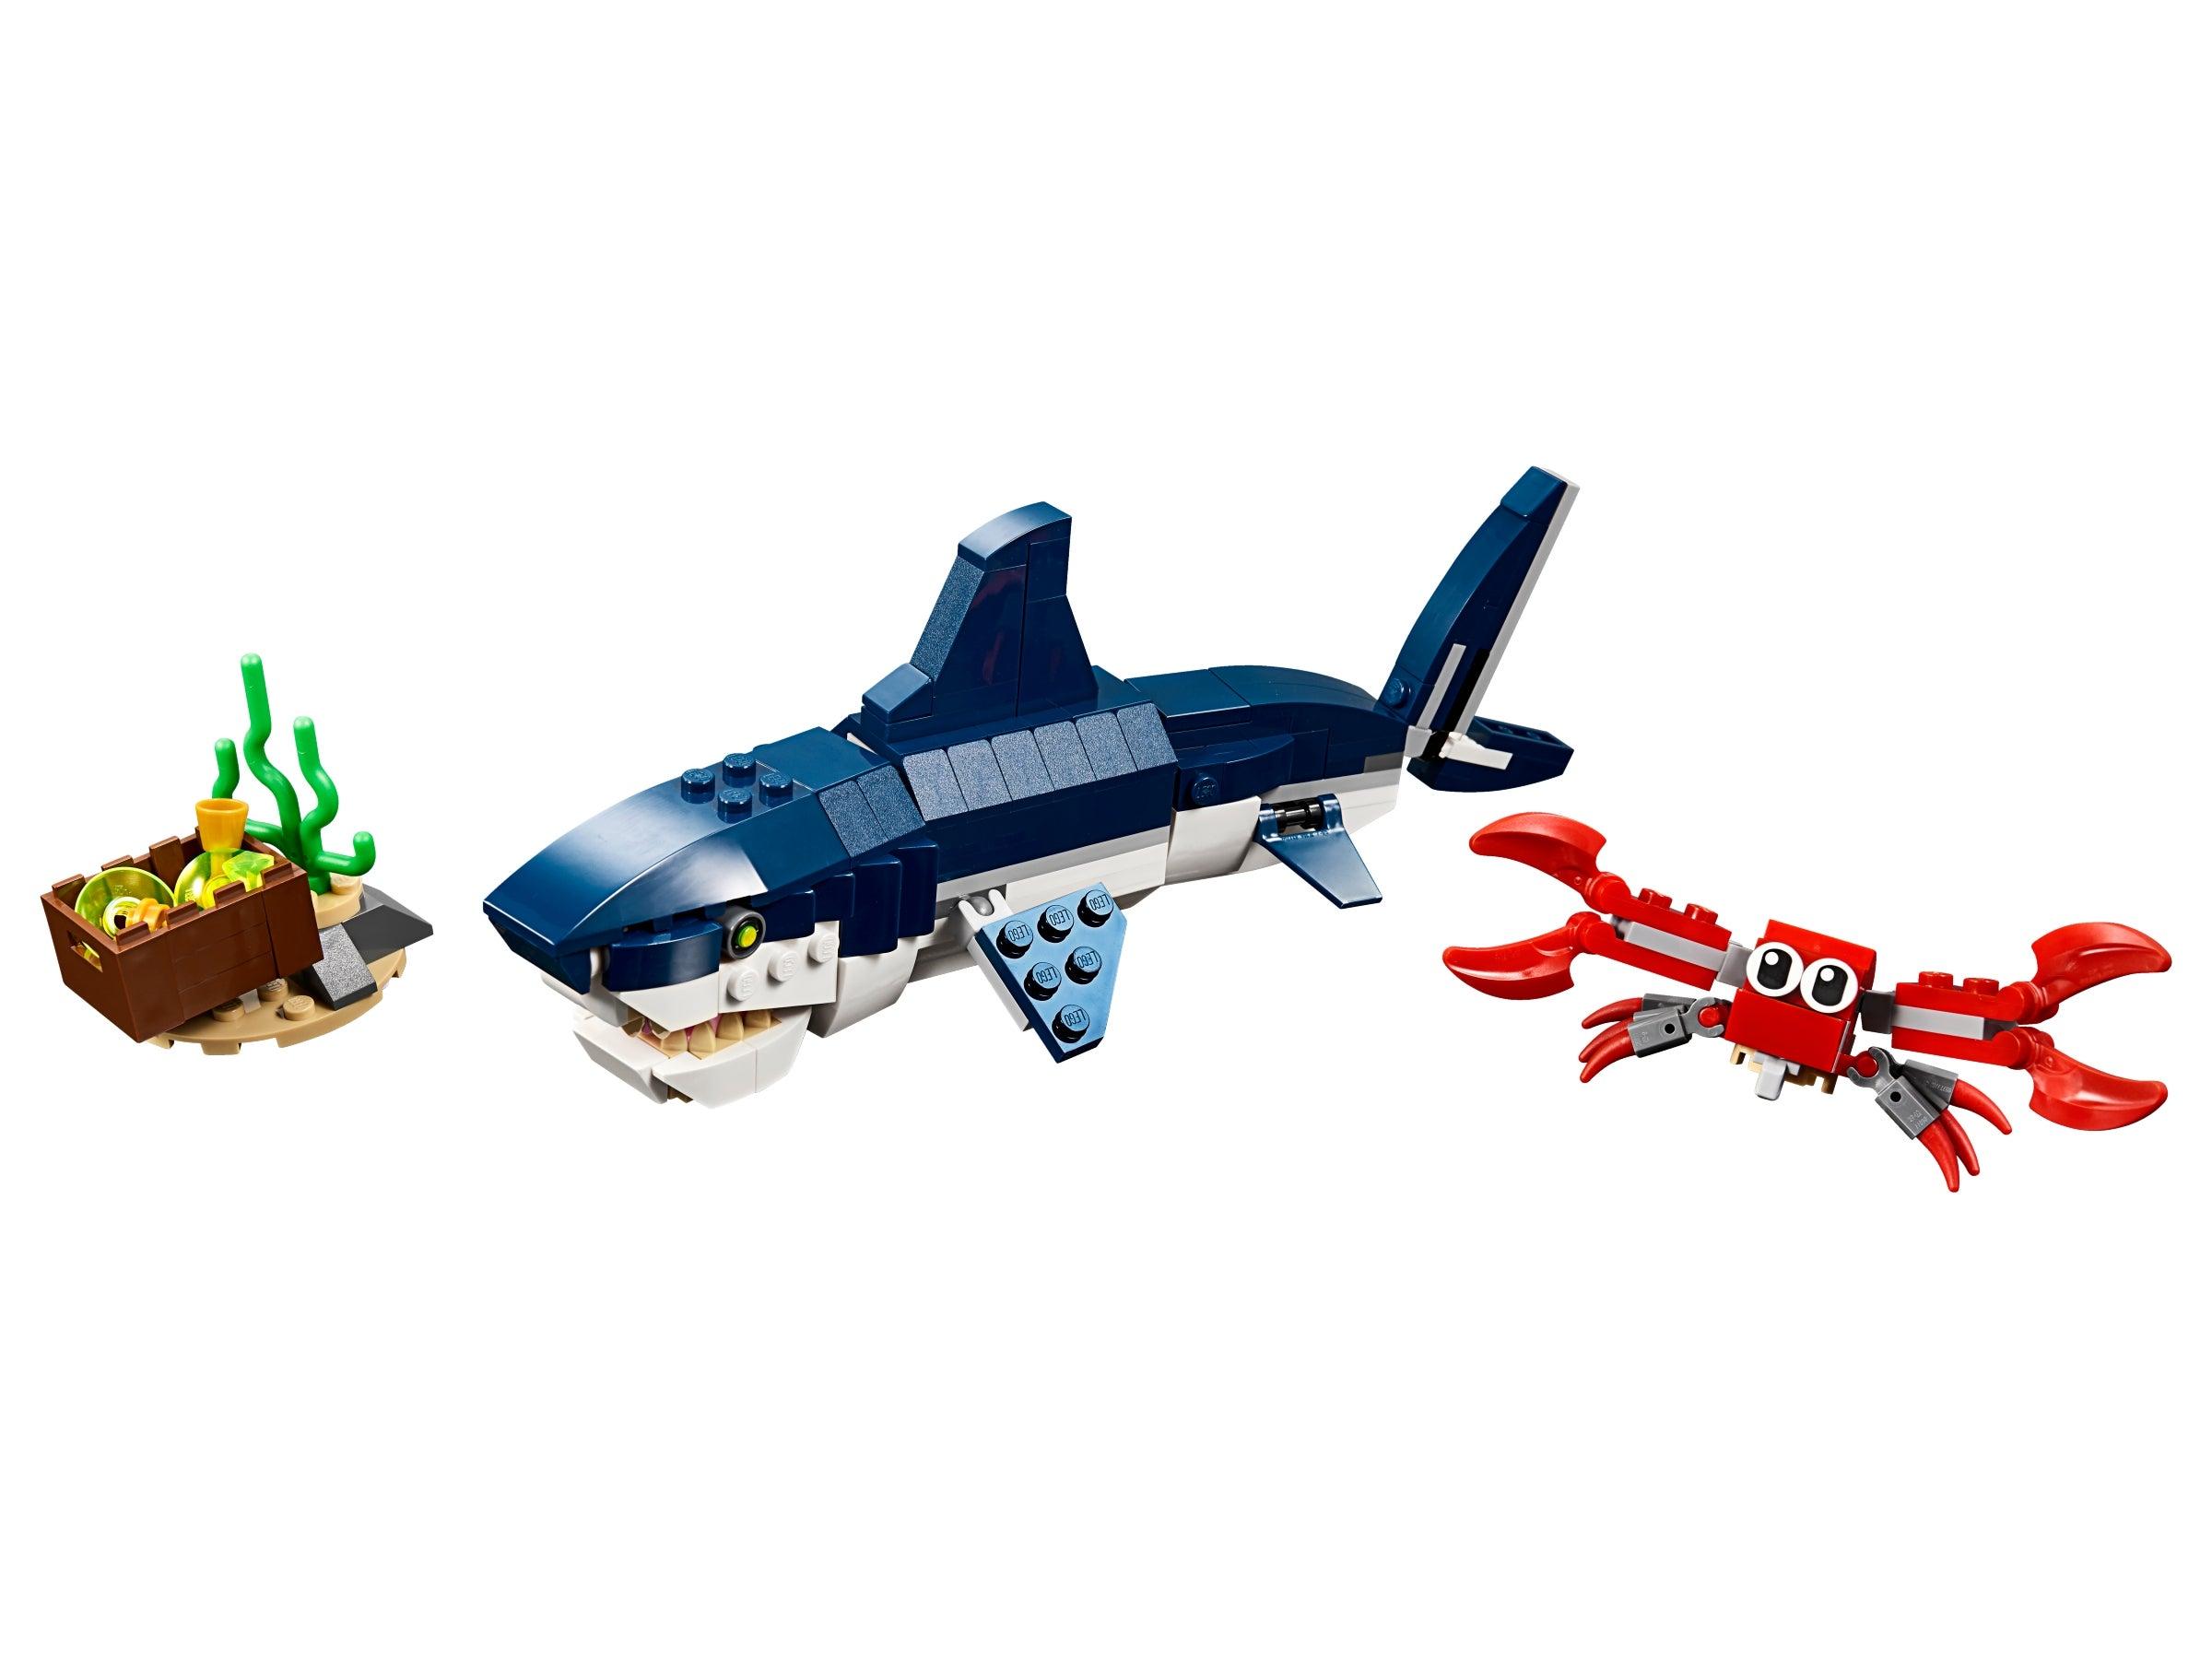 LEGO CREATOR DEEP SEA TOY SHARK CREATURES SET 31088 BRAND NEW BOXED